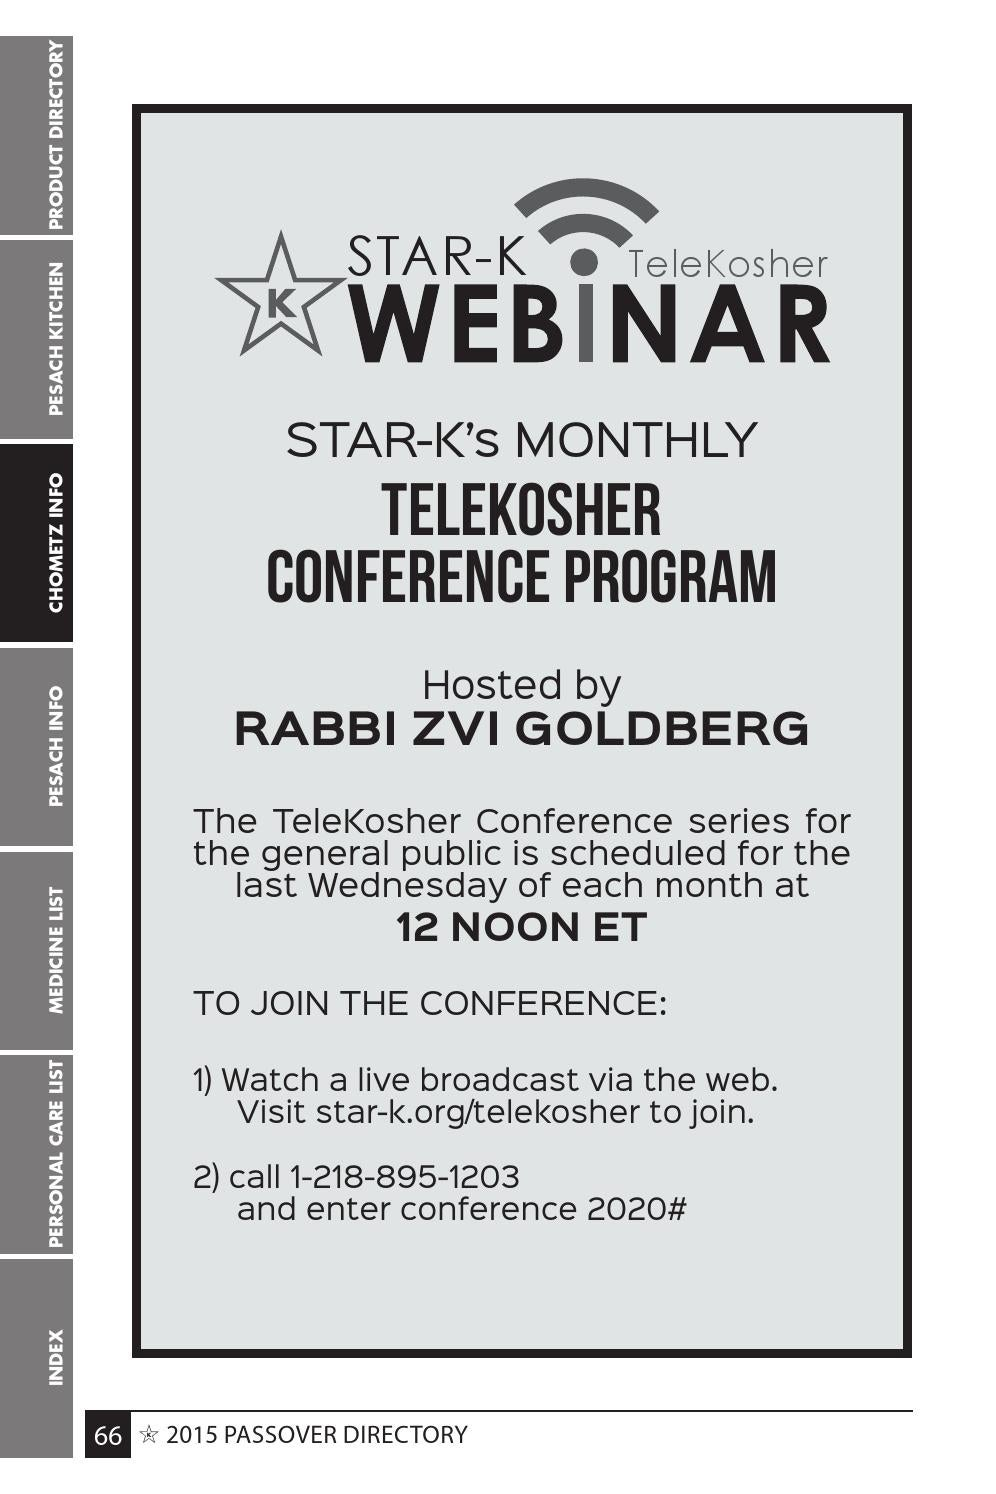 Kosher For Passover Medicine List 2020.Star K Passover Directory 2015 By Star K Kosher Issuu